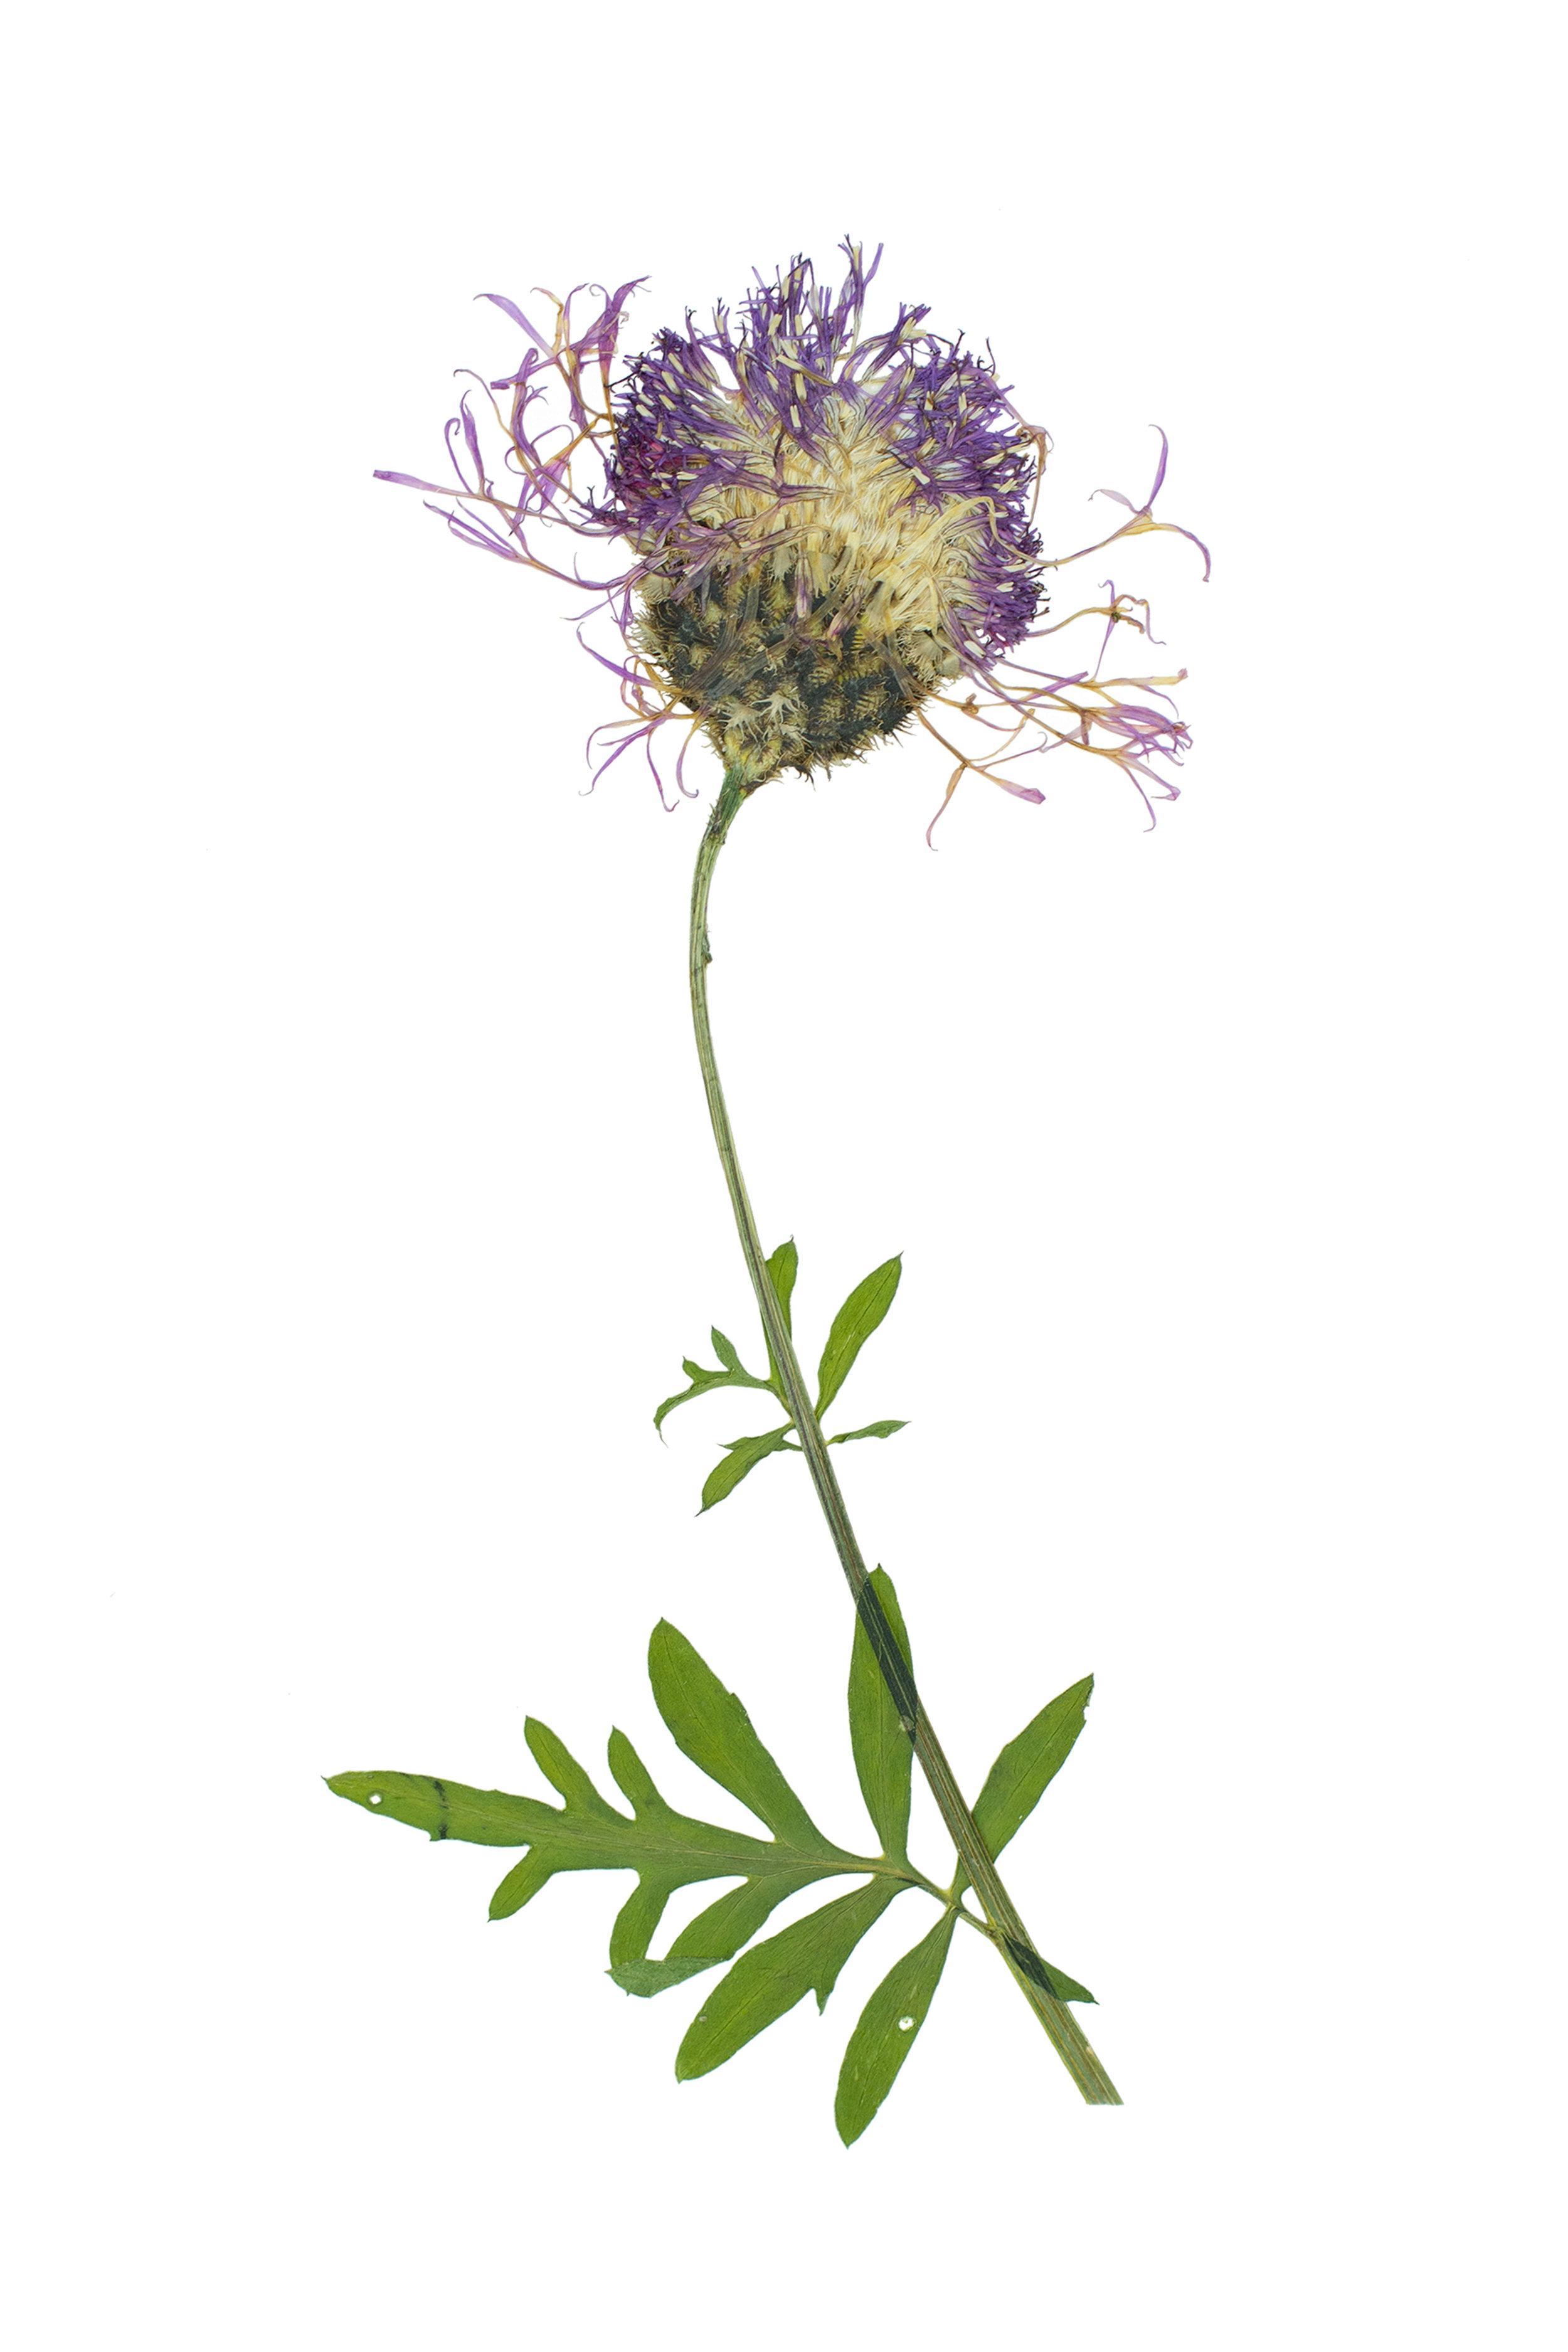 Greater Knapweed / Centaurea scabiosa